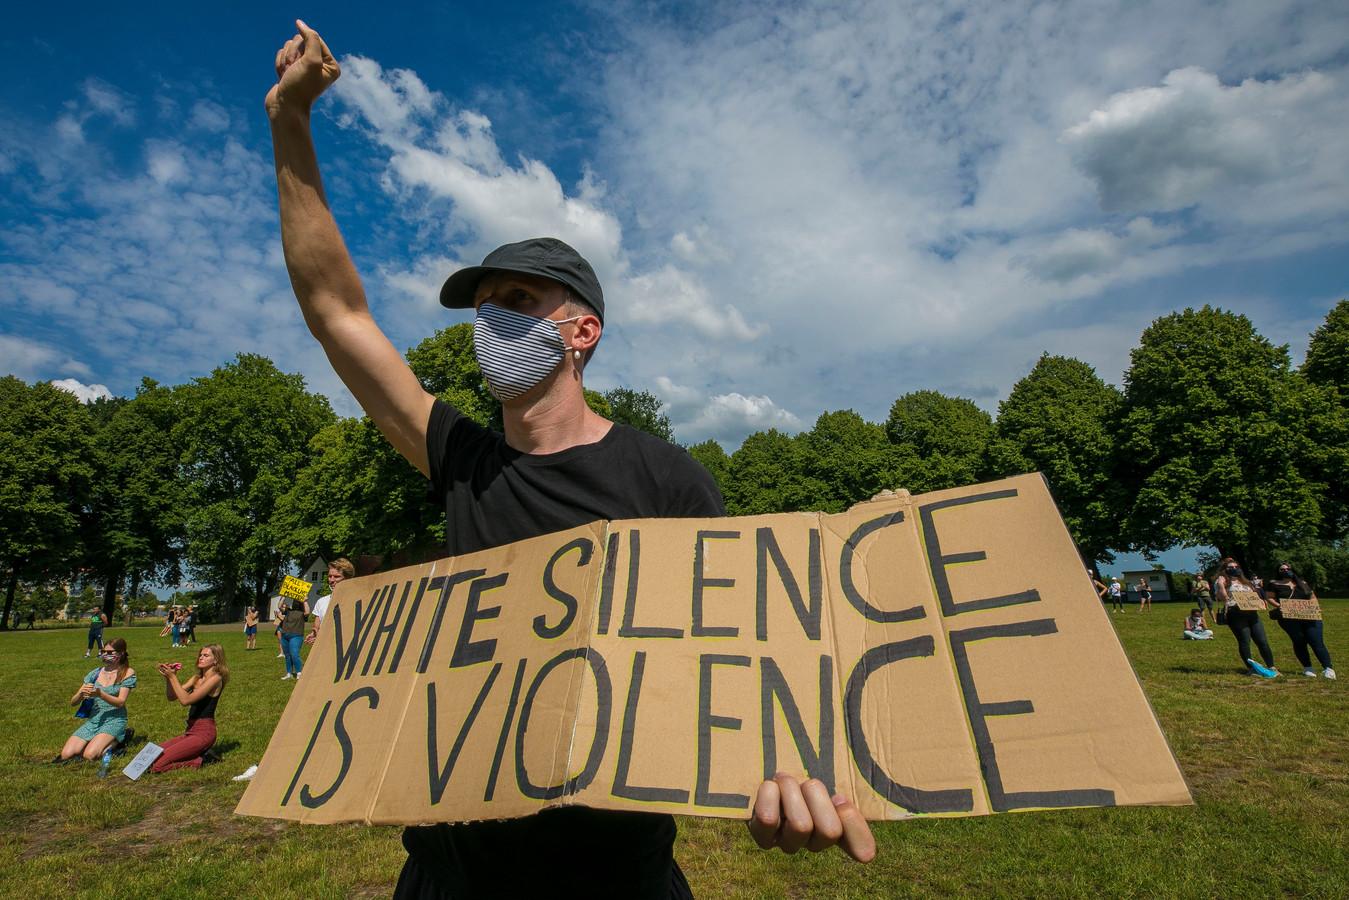 'White silence is violence' - Black Lives Matter demonstratie op de Pettelaarse Schans 's-Hertogenbosch.